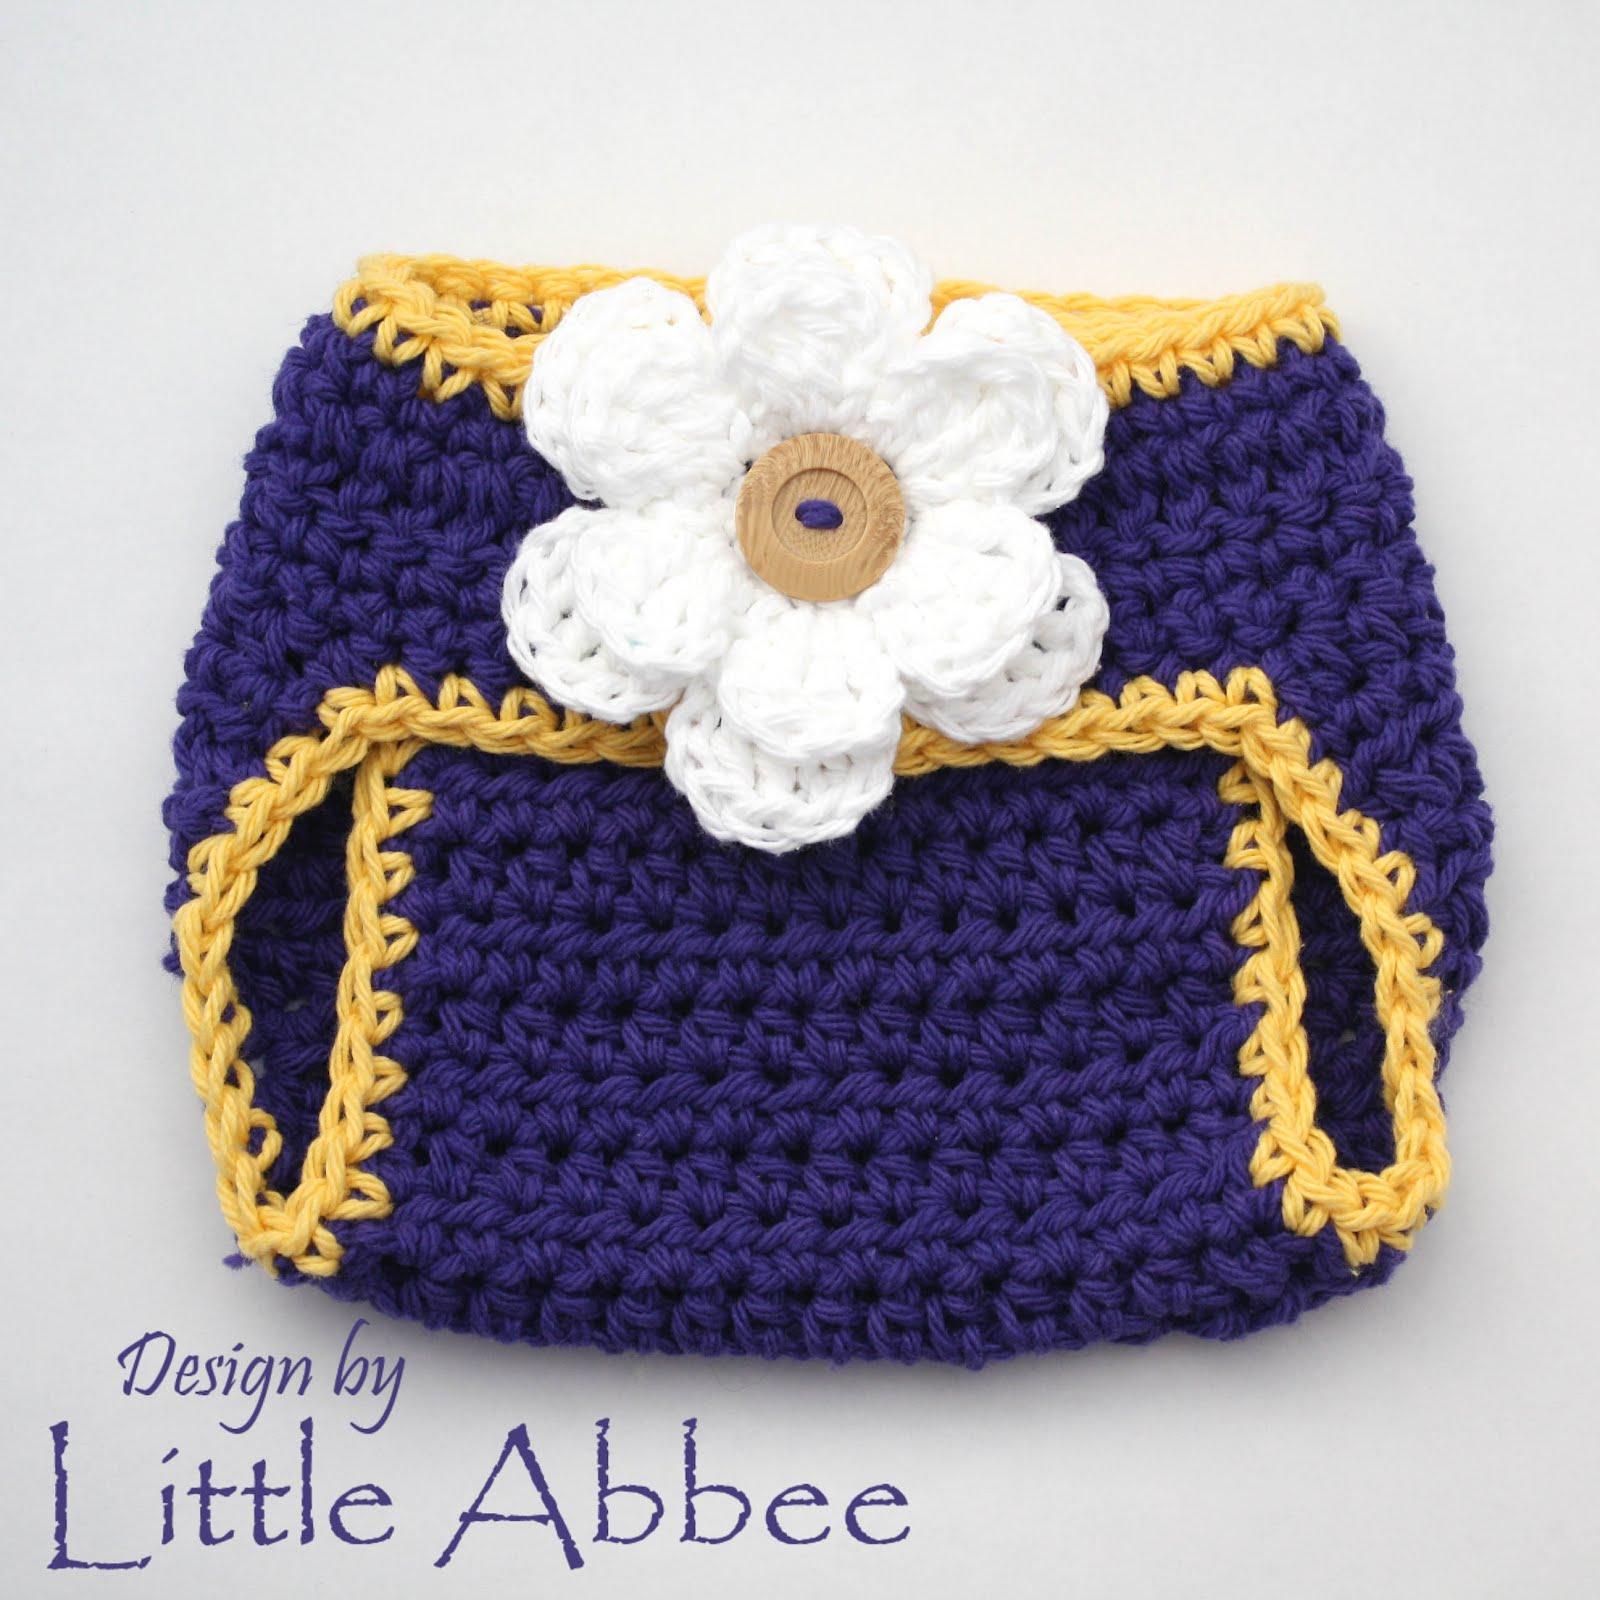 Crochet A Flowers Diaper Cover Pattern : Little Abbee: Diaper Cover Crochet Pattern